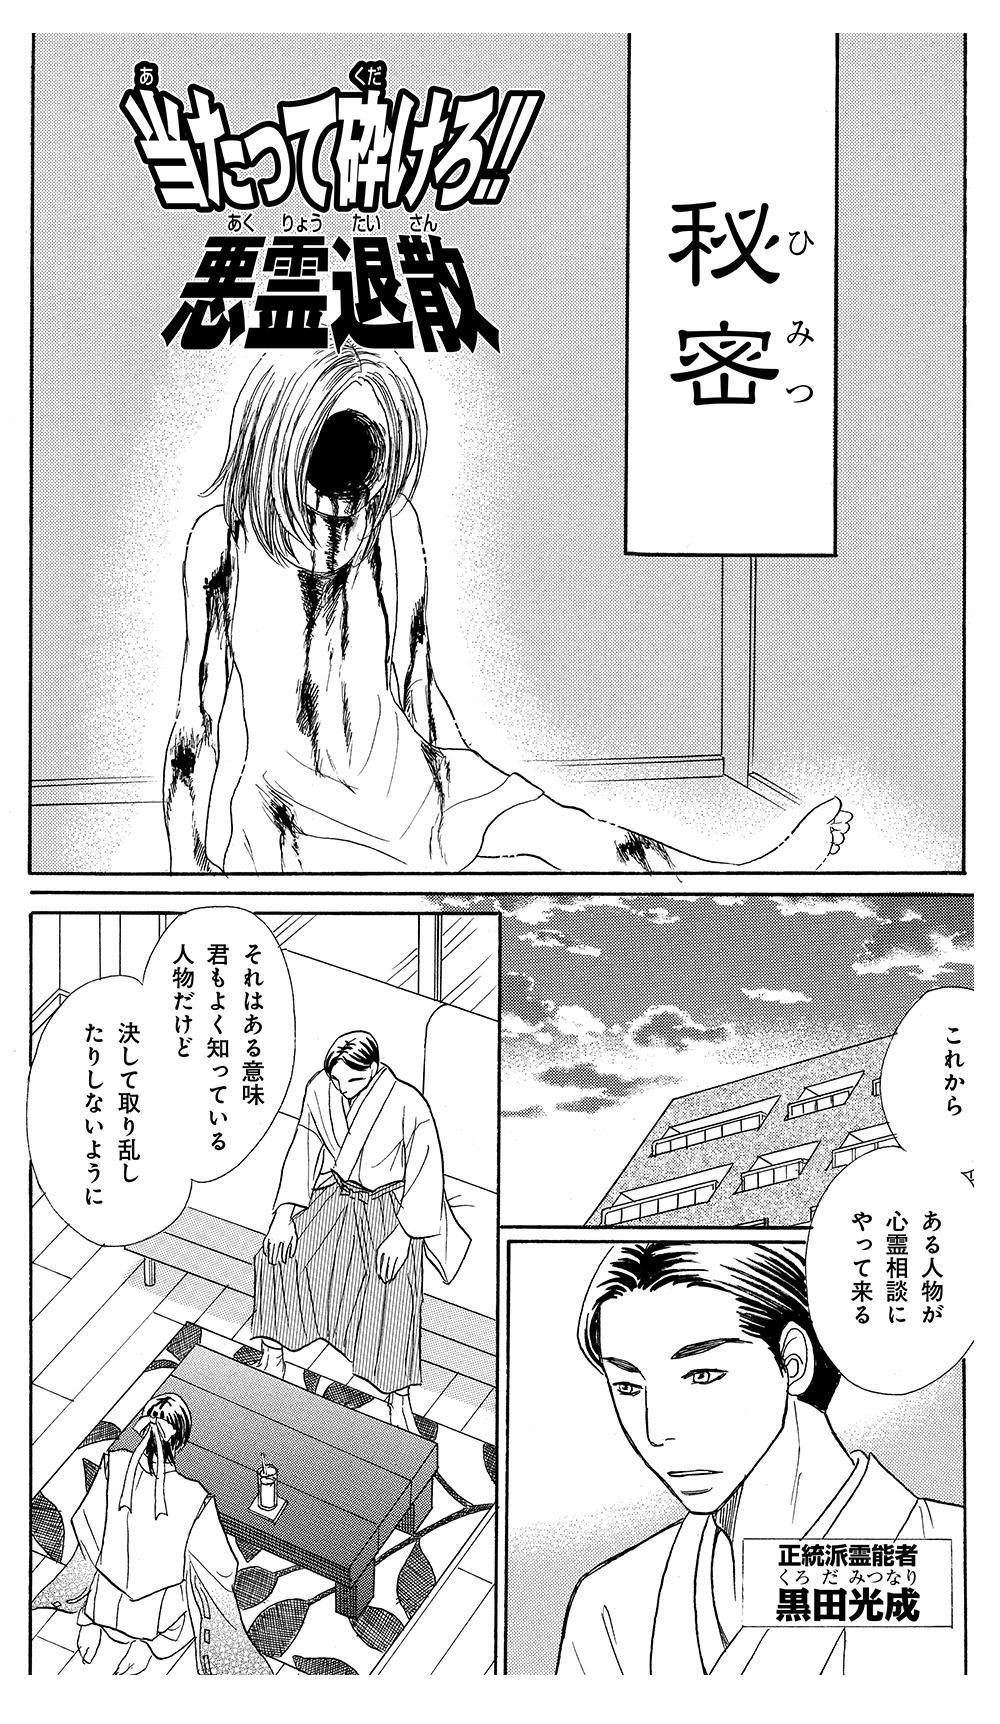 ijyuintukimaru-074.jpg